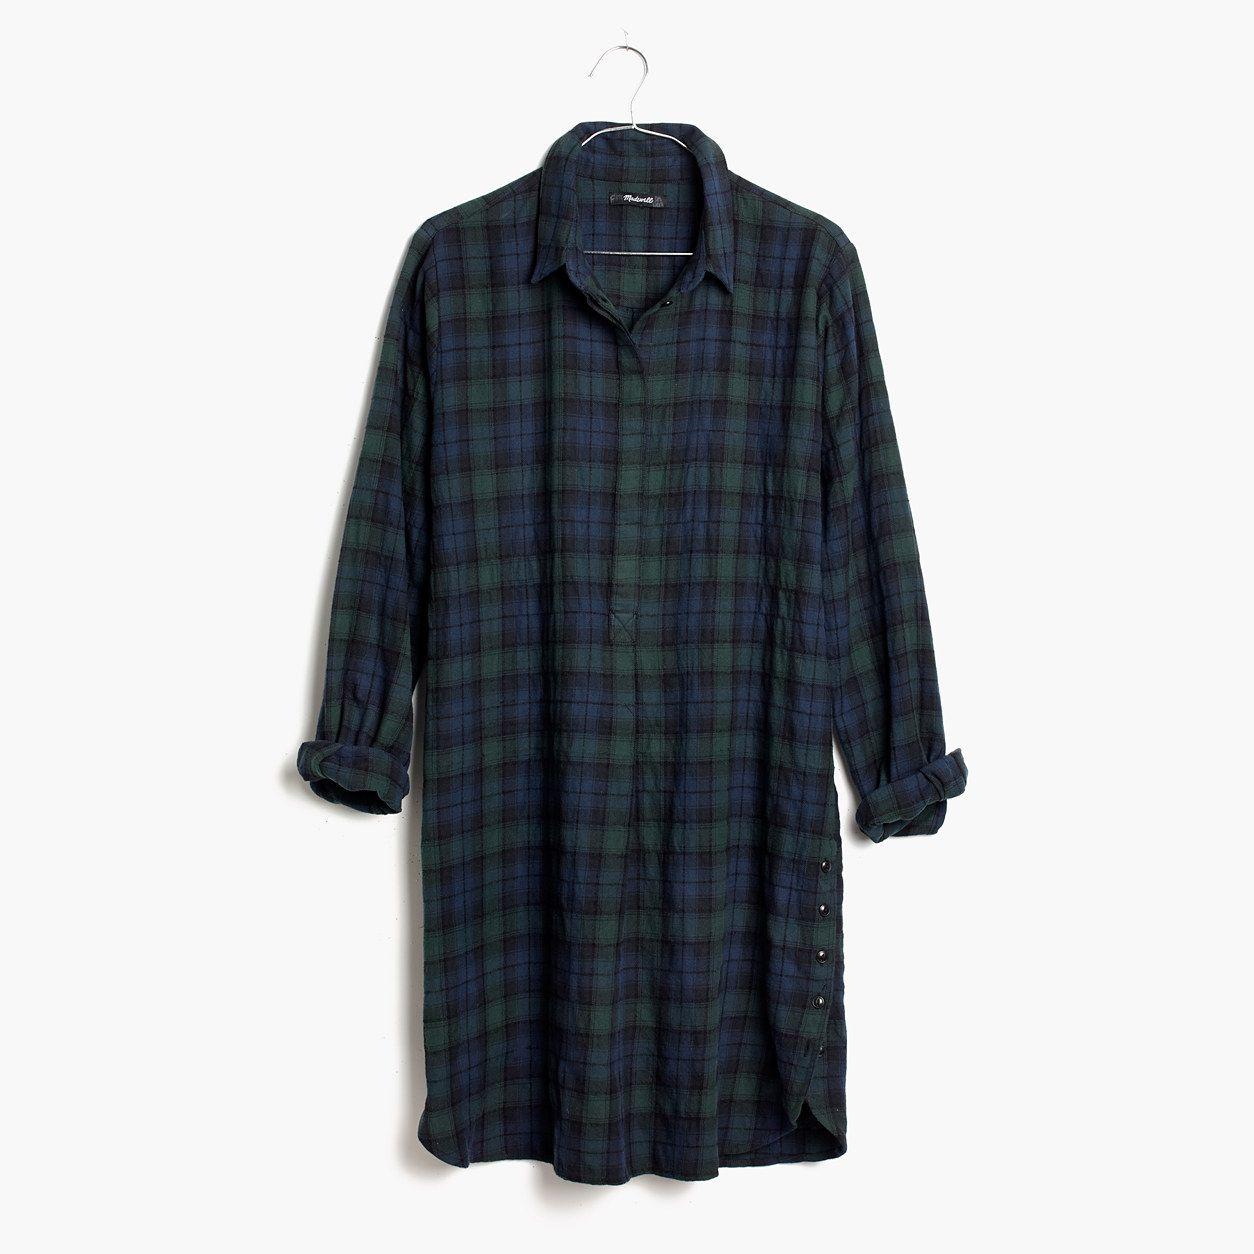 Navy blue flannel shirt womens  Madewell Womens Flannel SideButton Shirtdress In Dark Plaid